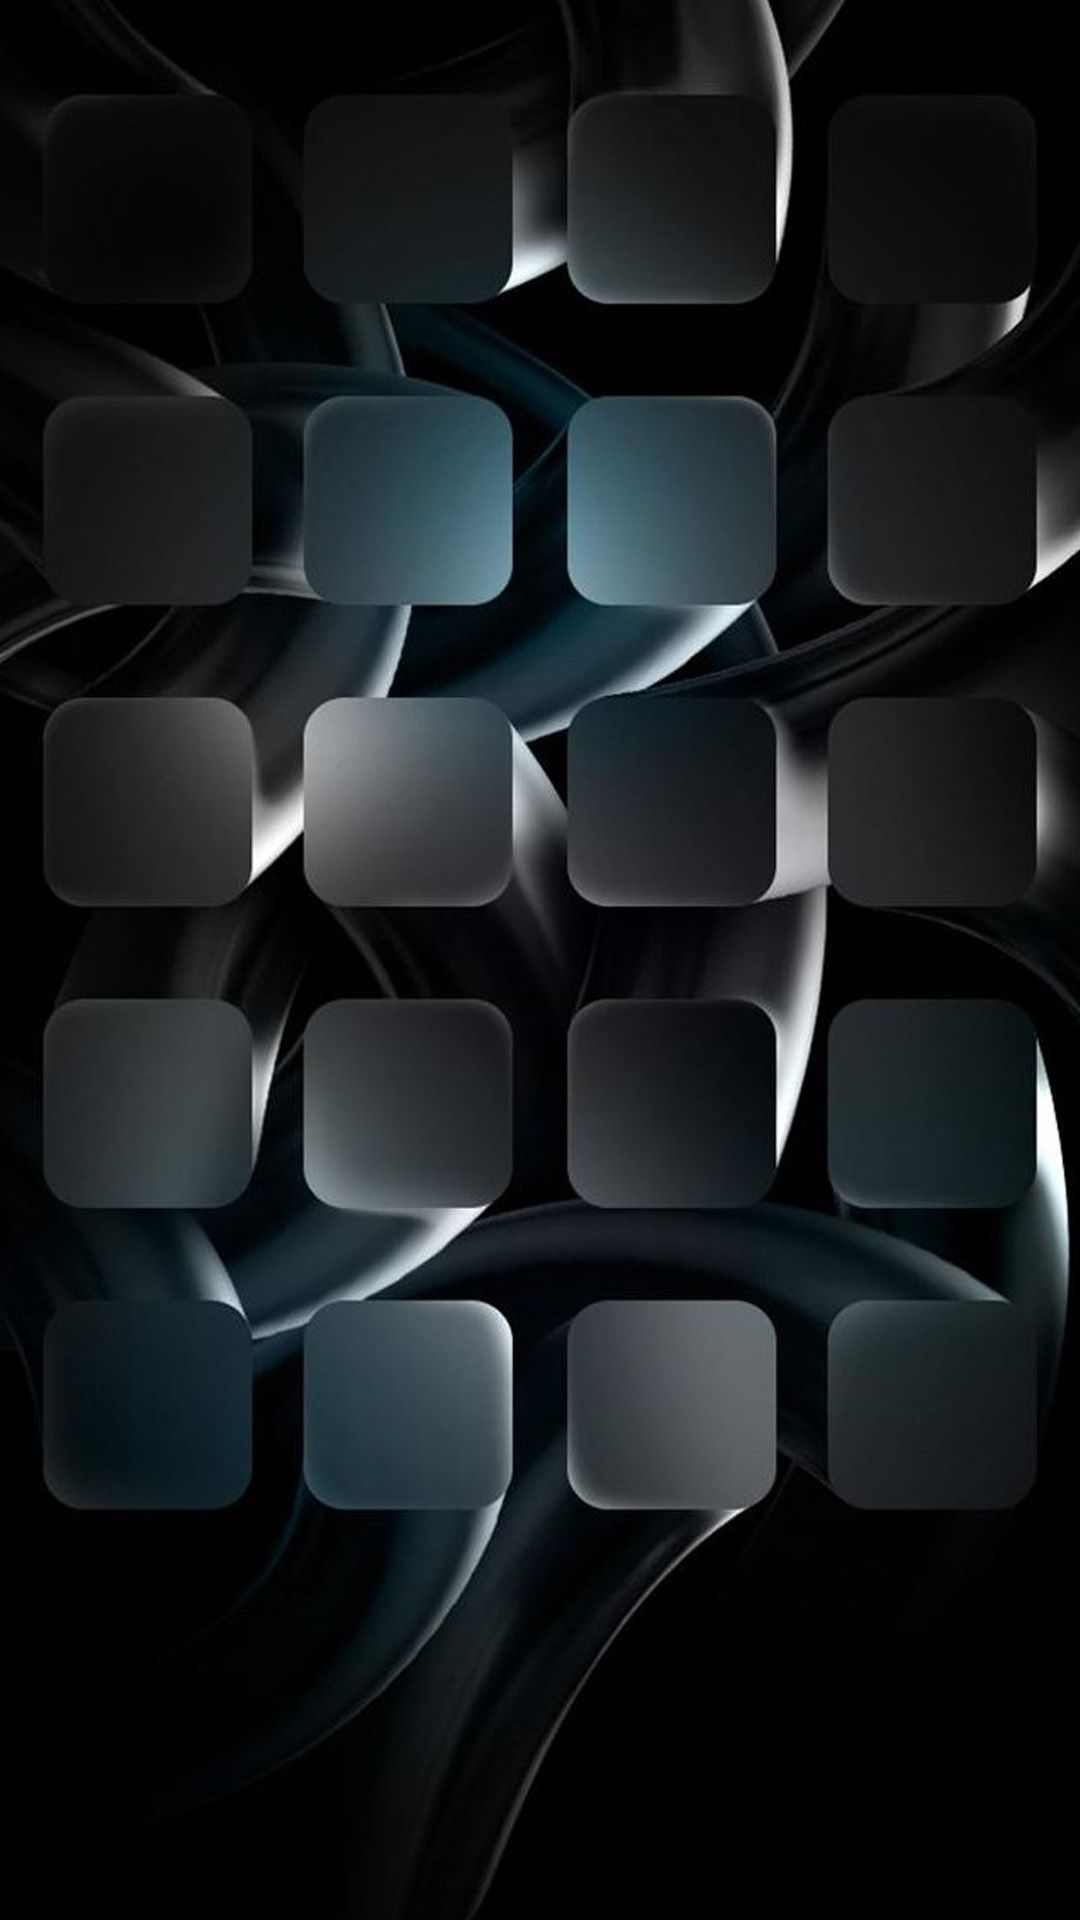 HD Samsung Galaxy A Wallpapers